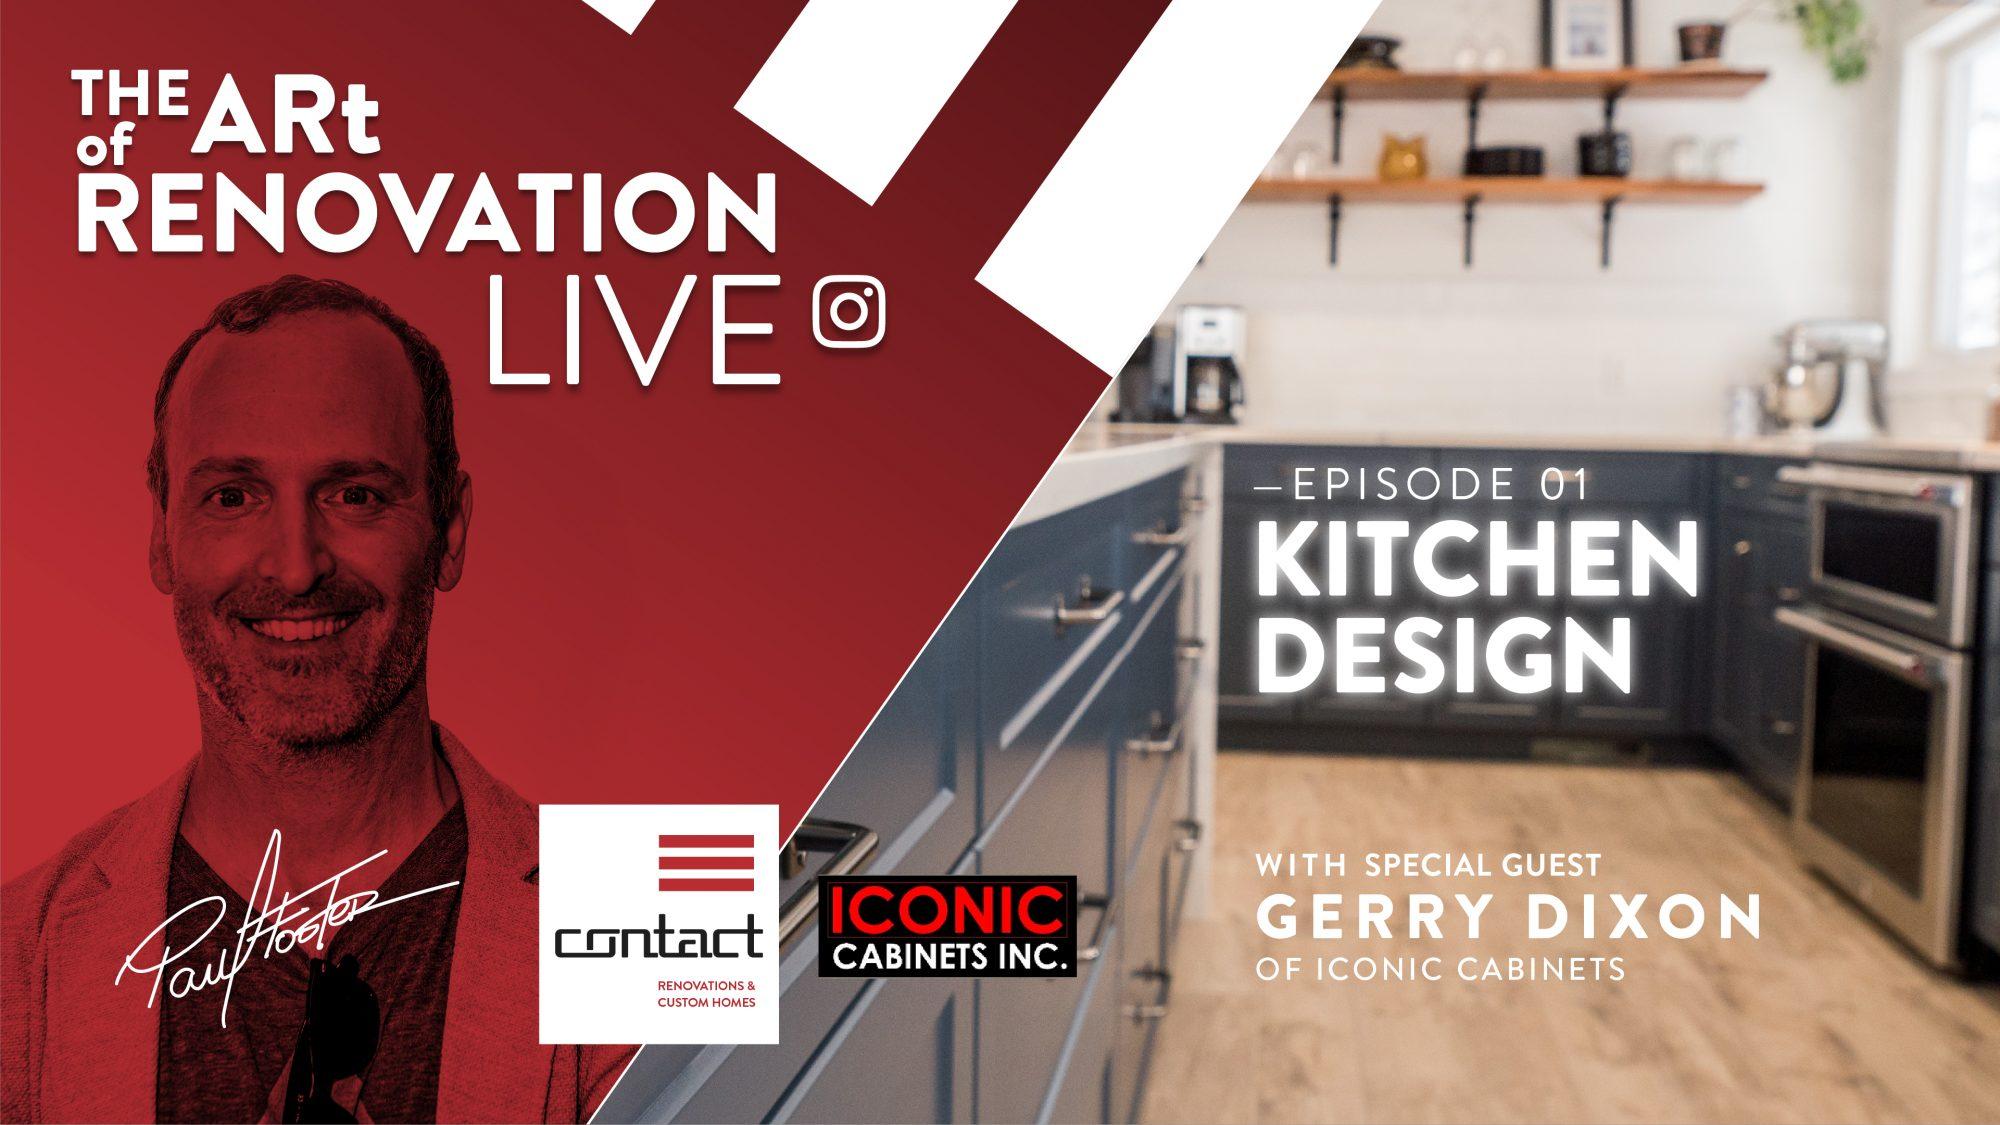 The Art of Renovation LIVE! Kitchen Design